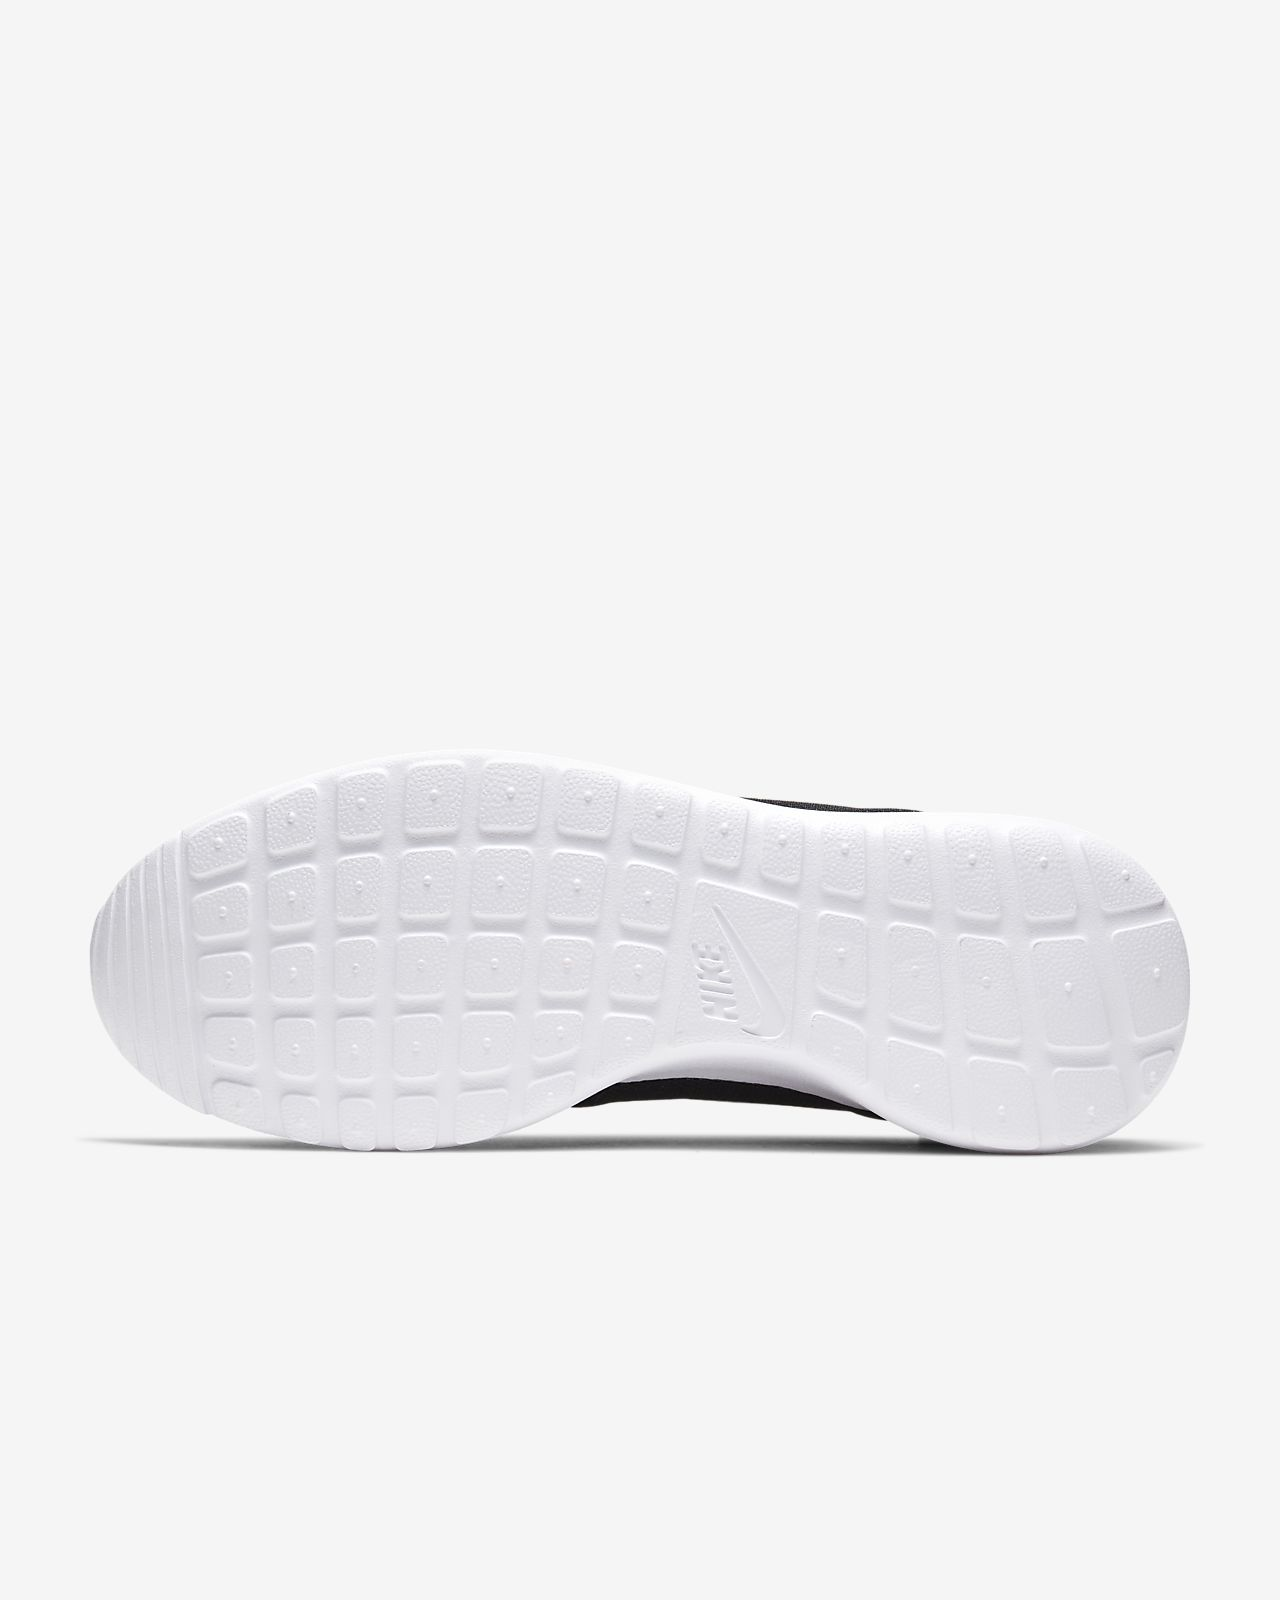 15e1639adeb40d Nike Roshe One Women s Shoe. Nike.com